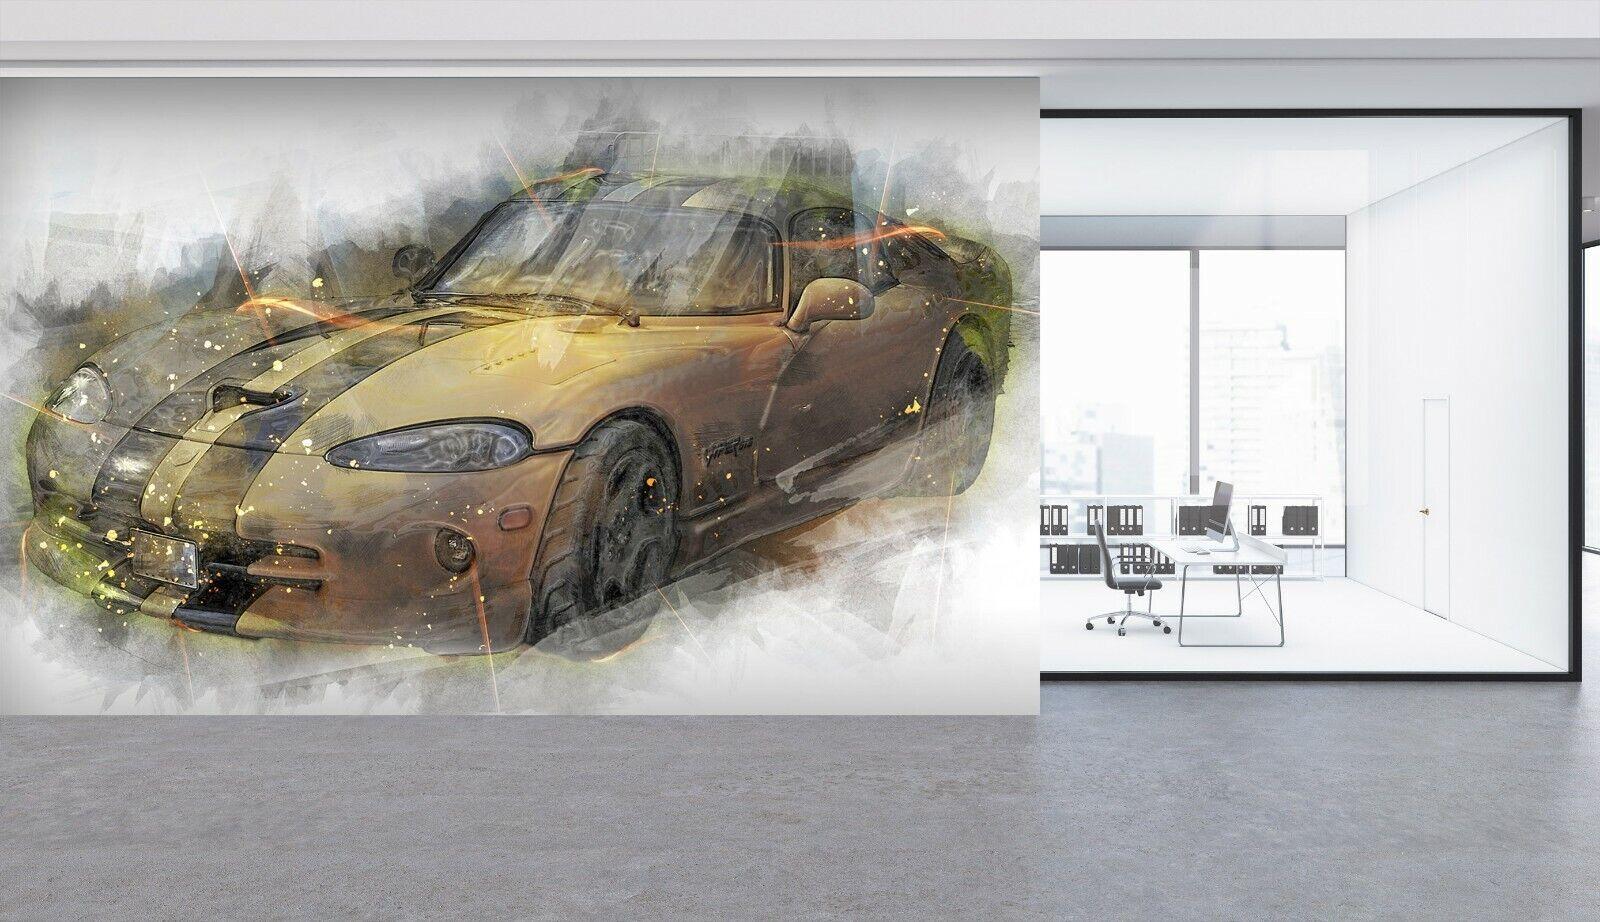 3D Cool Sports Car B018 Car WandPapier Mural Sefl-adhesive Removable Wendy